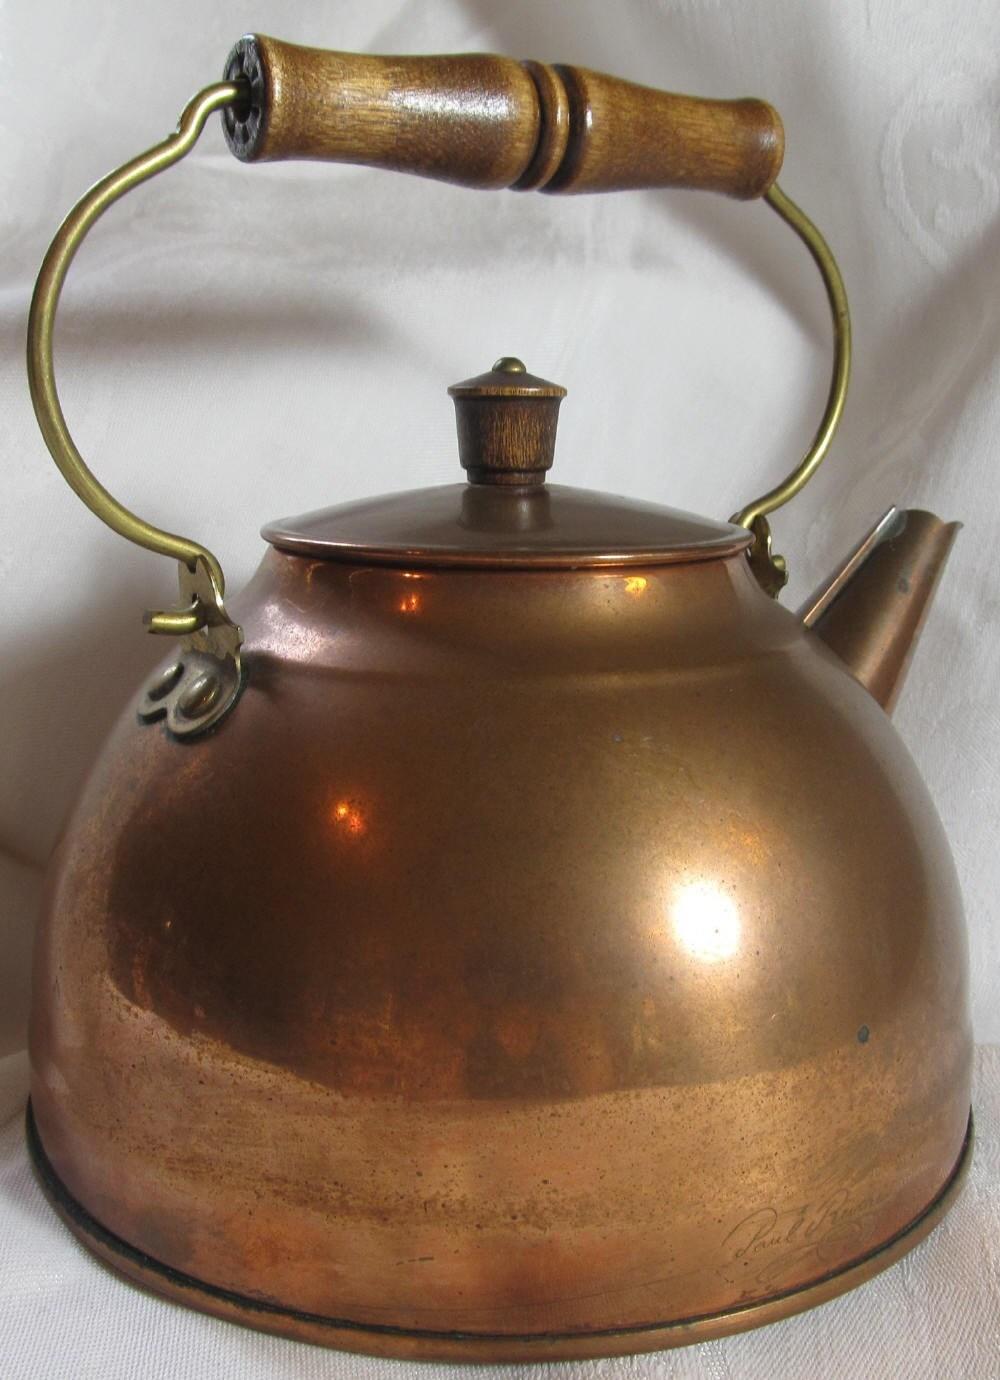 Vintage Revereware Copper Tea Kettle By Baliavintage On Etsy